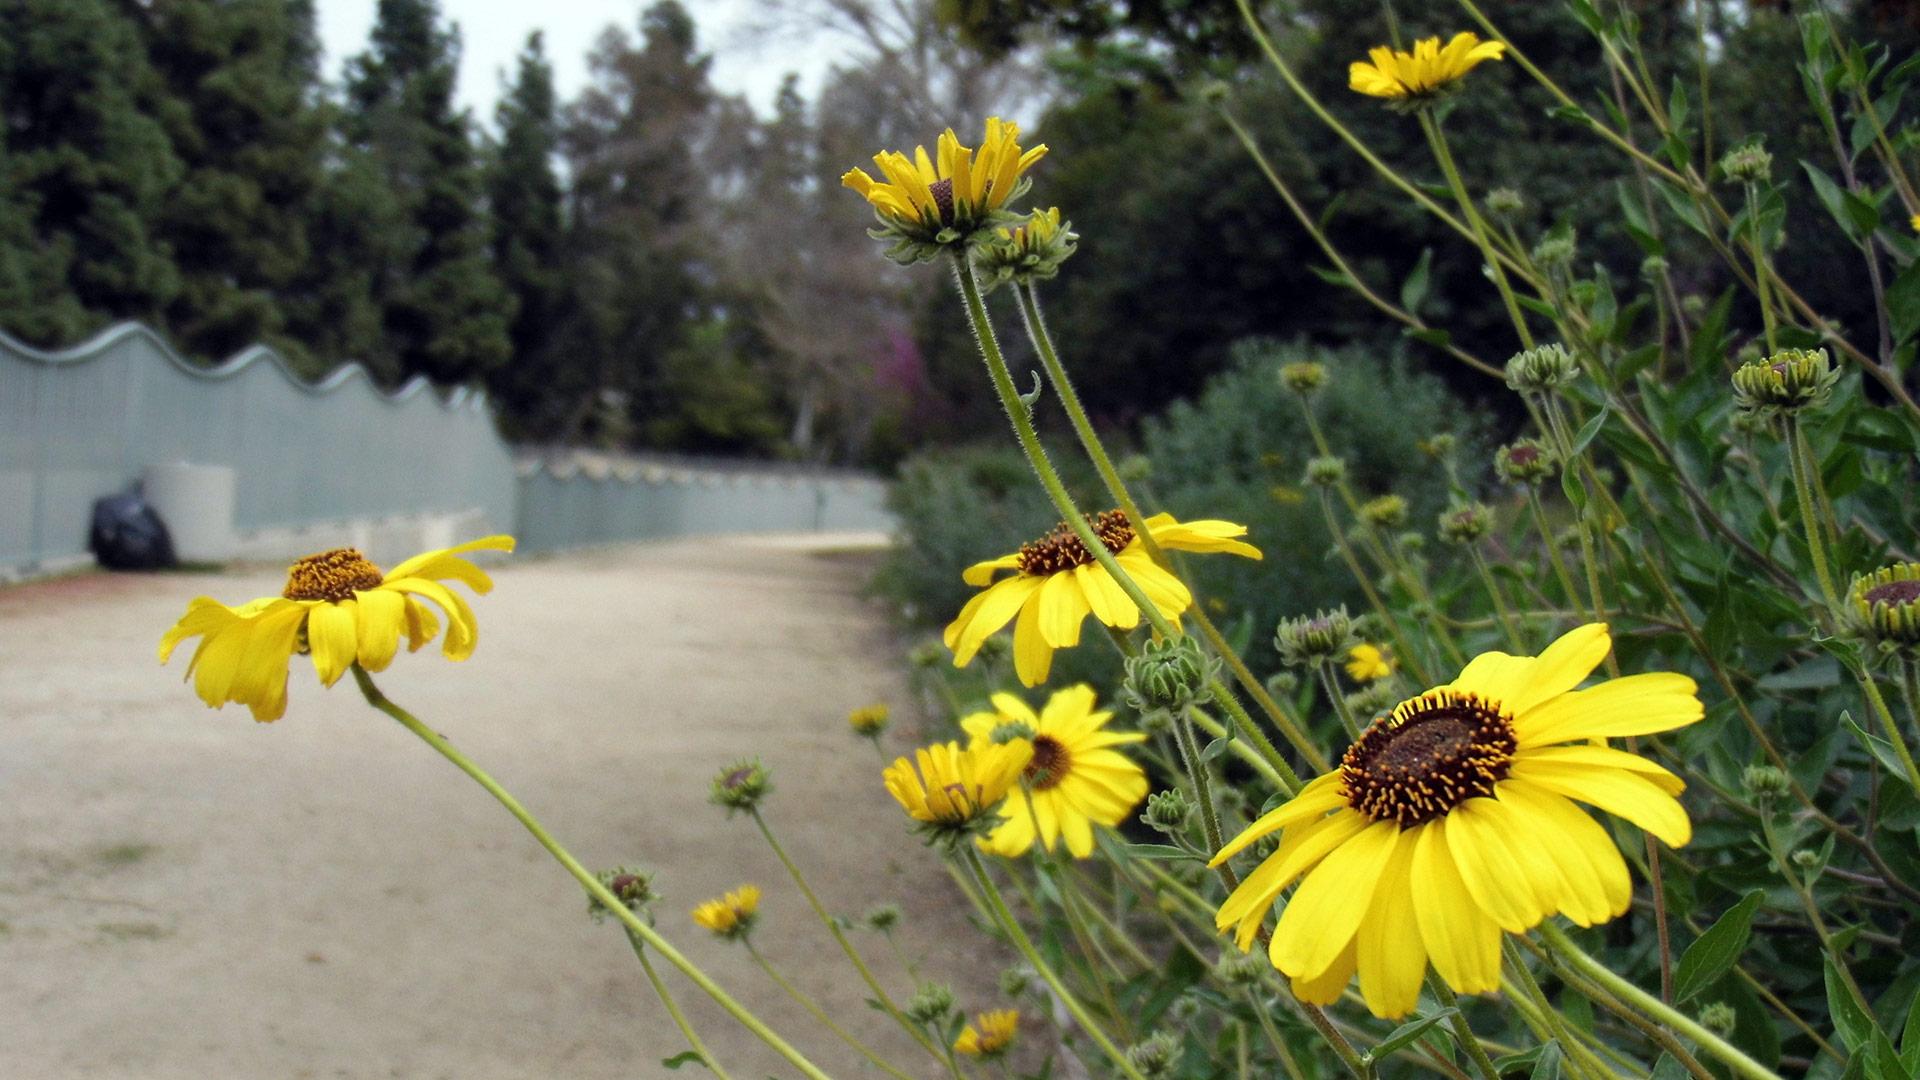 Wildflowers along Valleyheart Greenway. | Sandi Hemmerlein